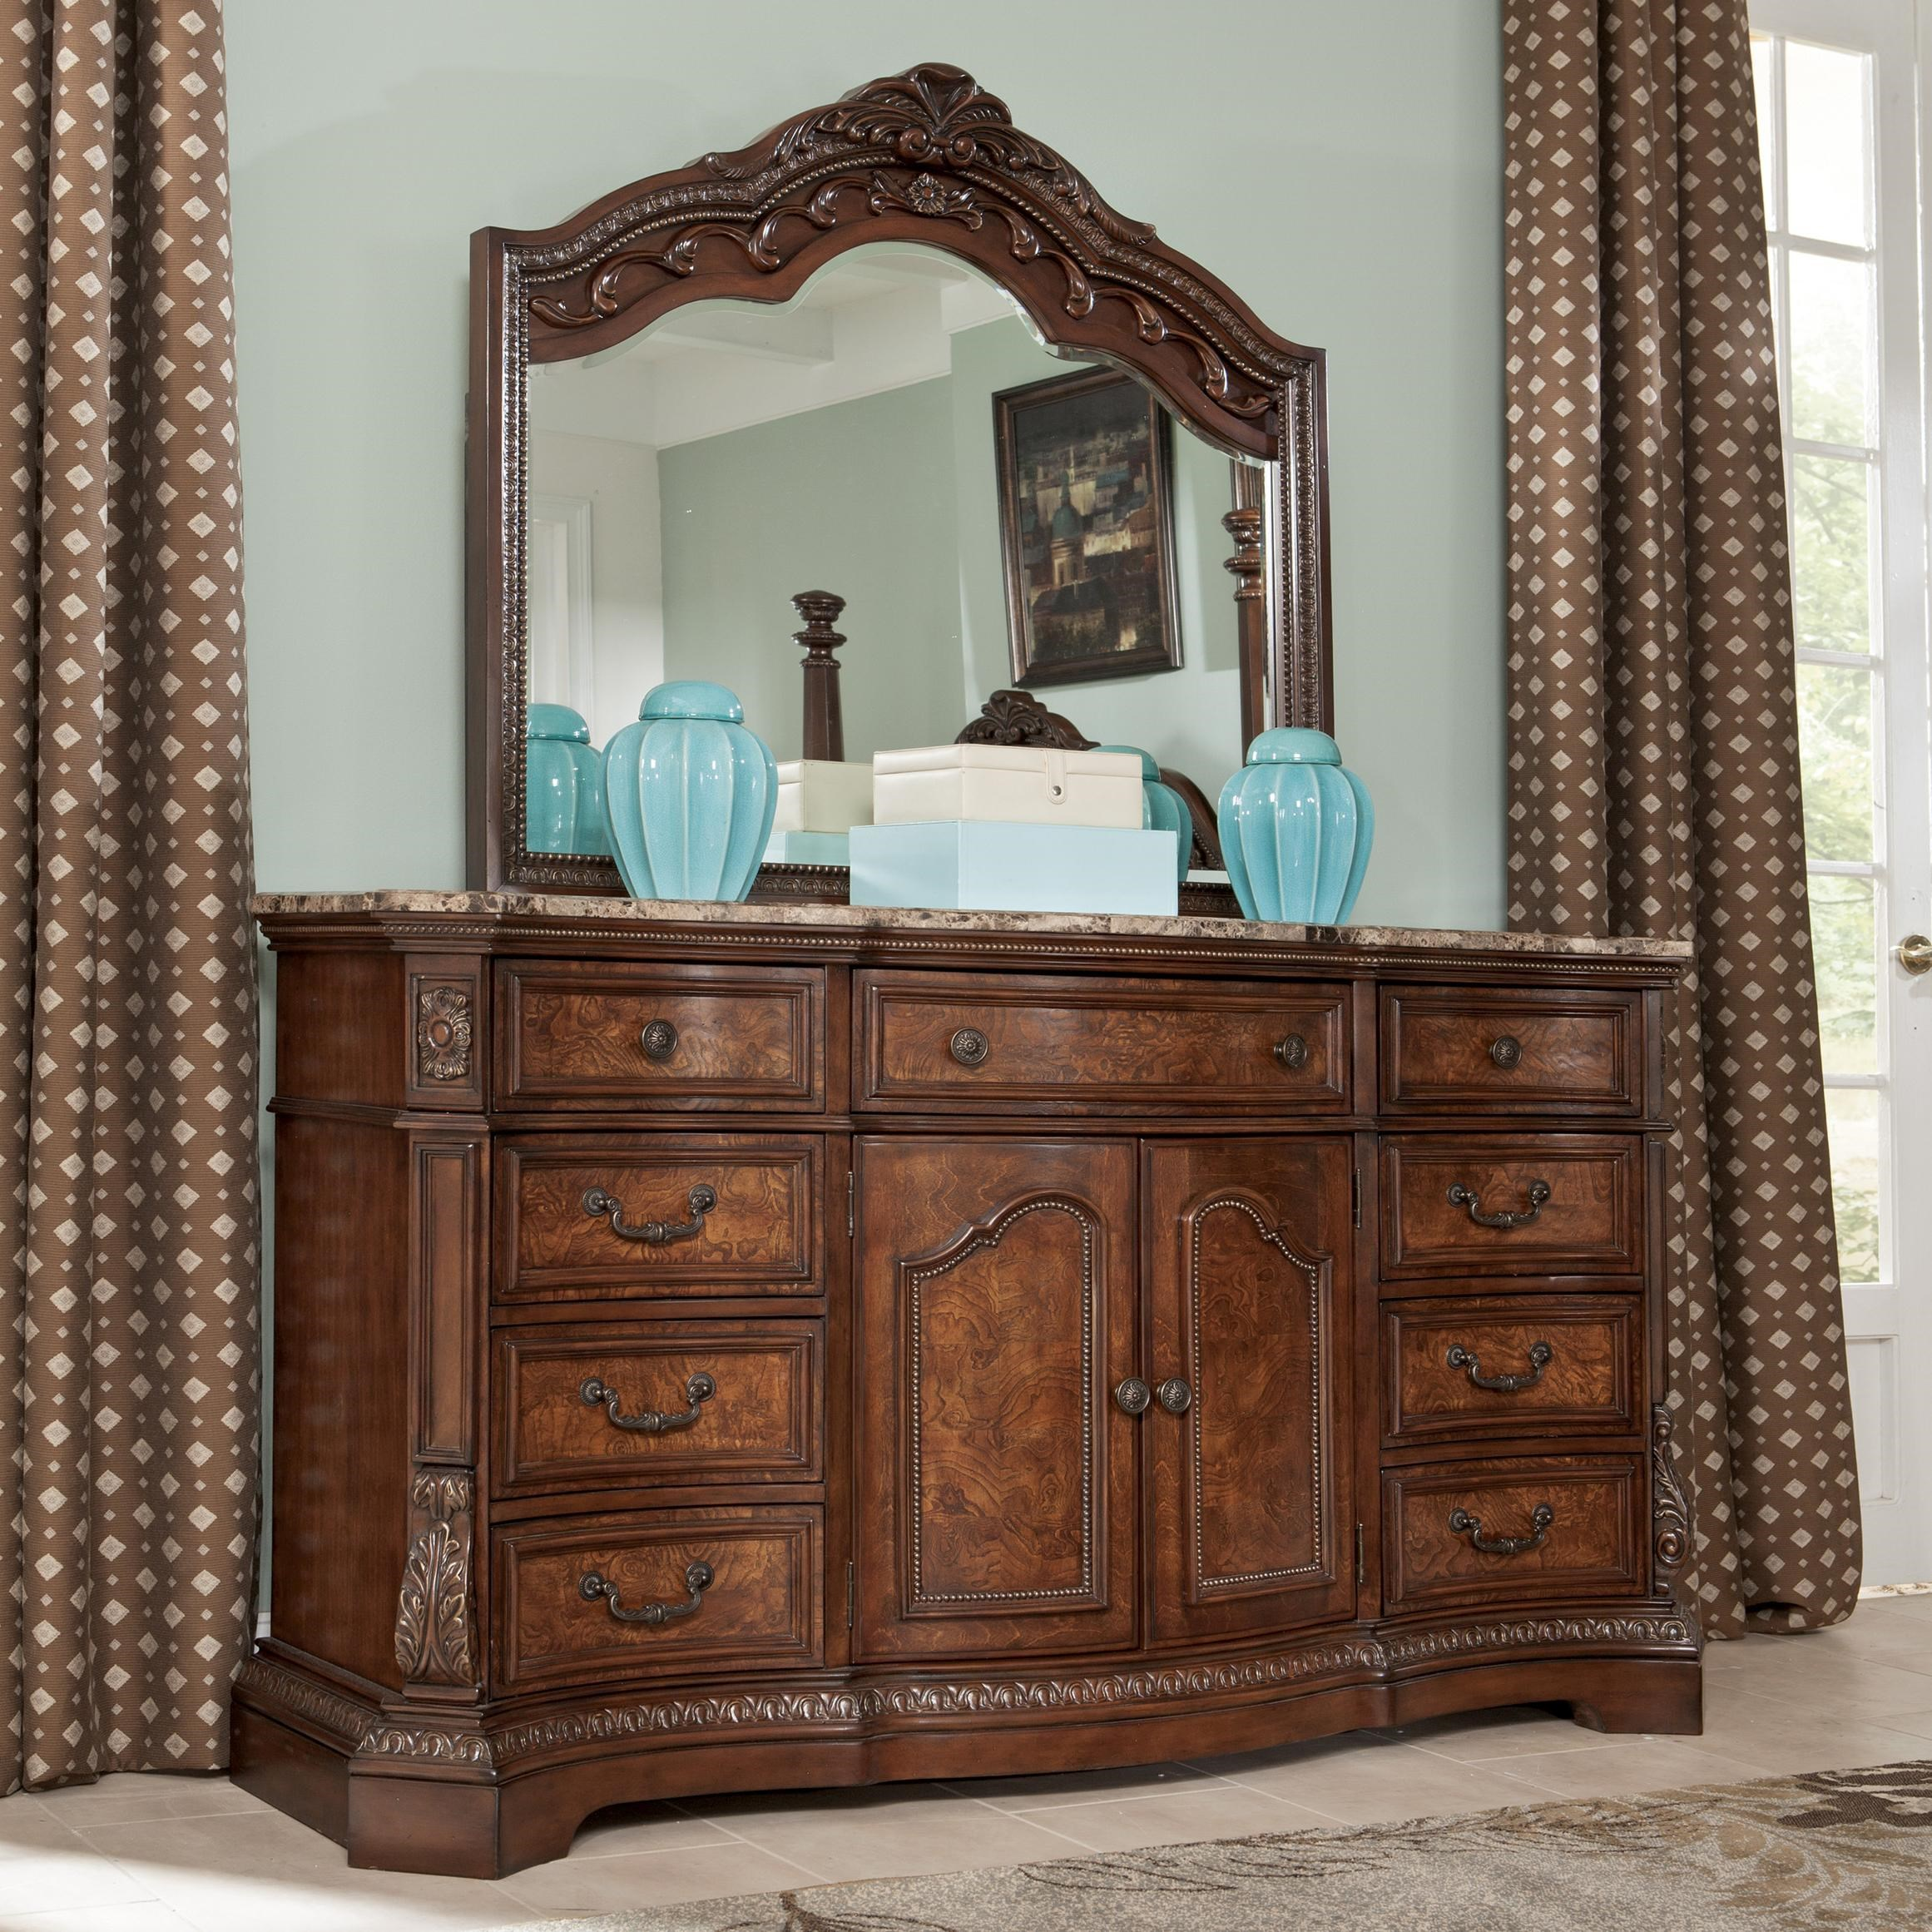 Millennium Ledelle Serpentine Shape Dresser With Natural Marble Rhlindysfurniture: Bedroom Dresser With Mirror At Home Improvement Advice